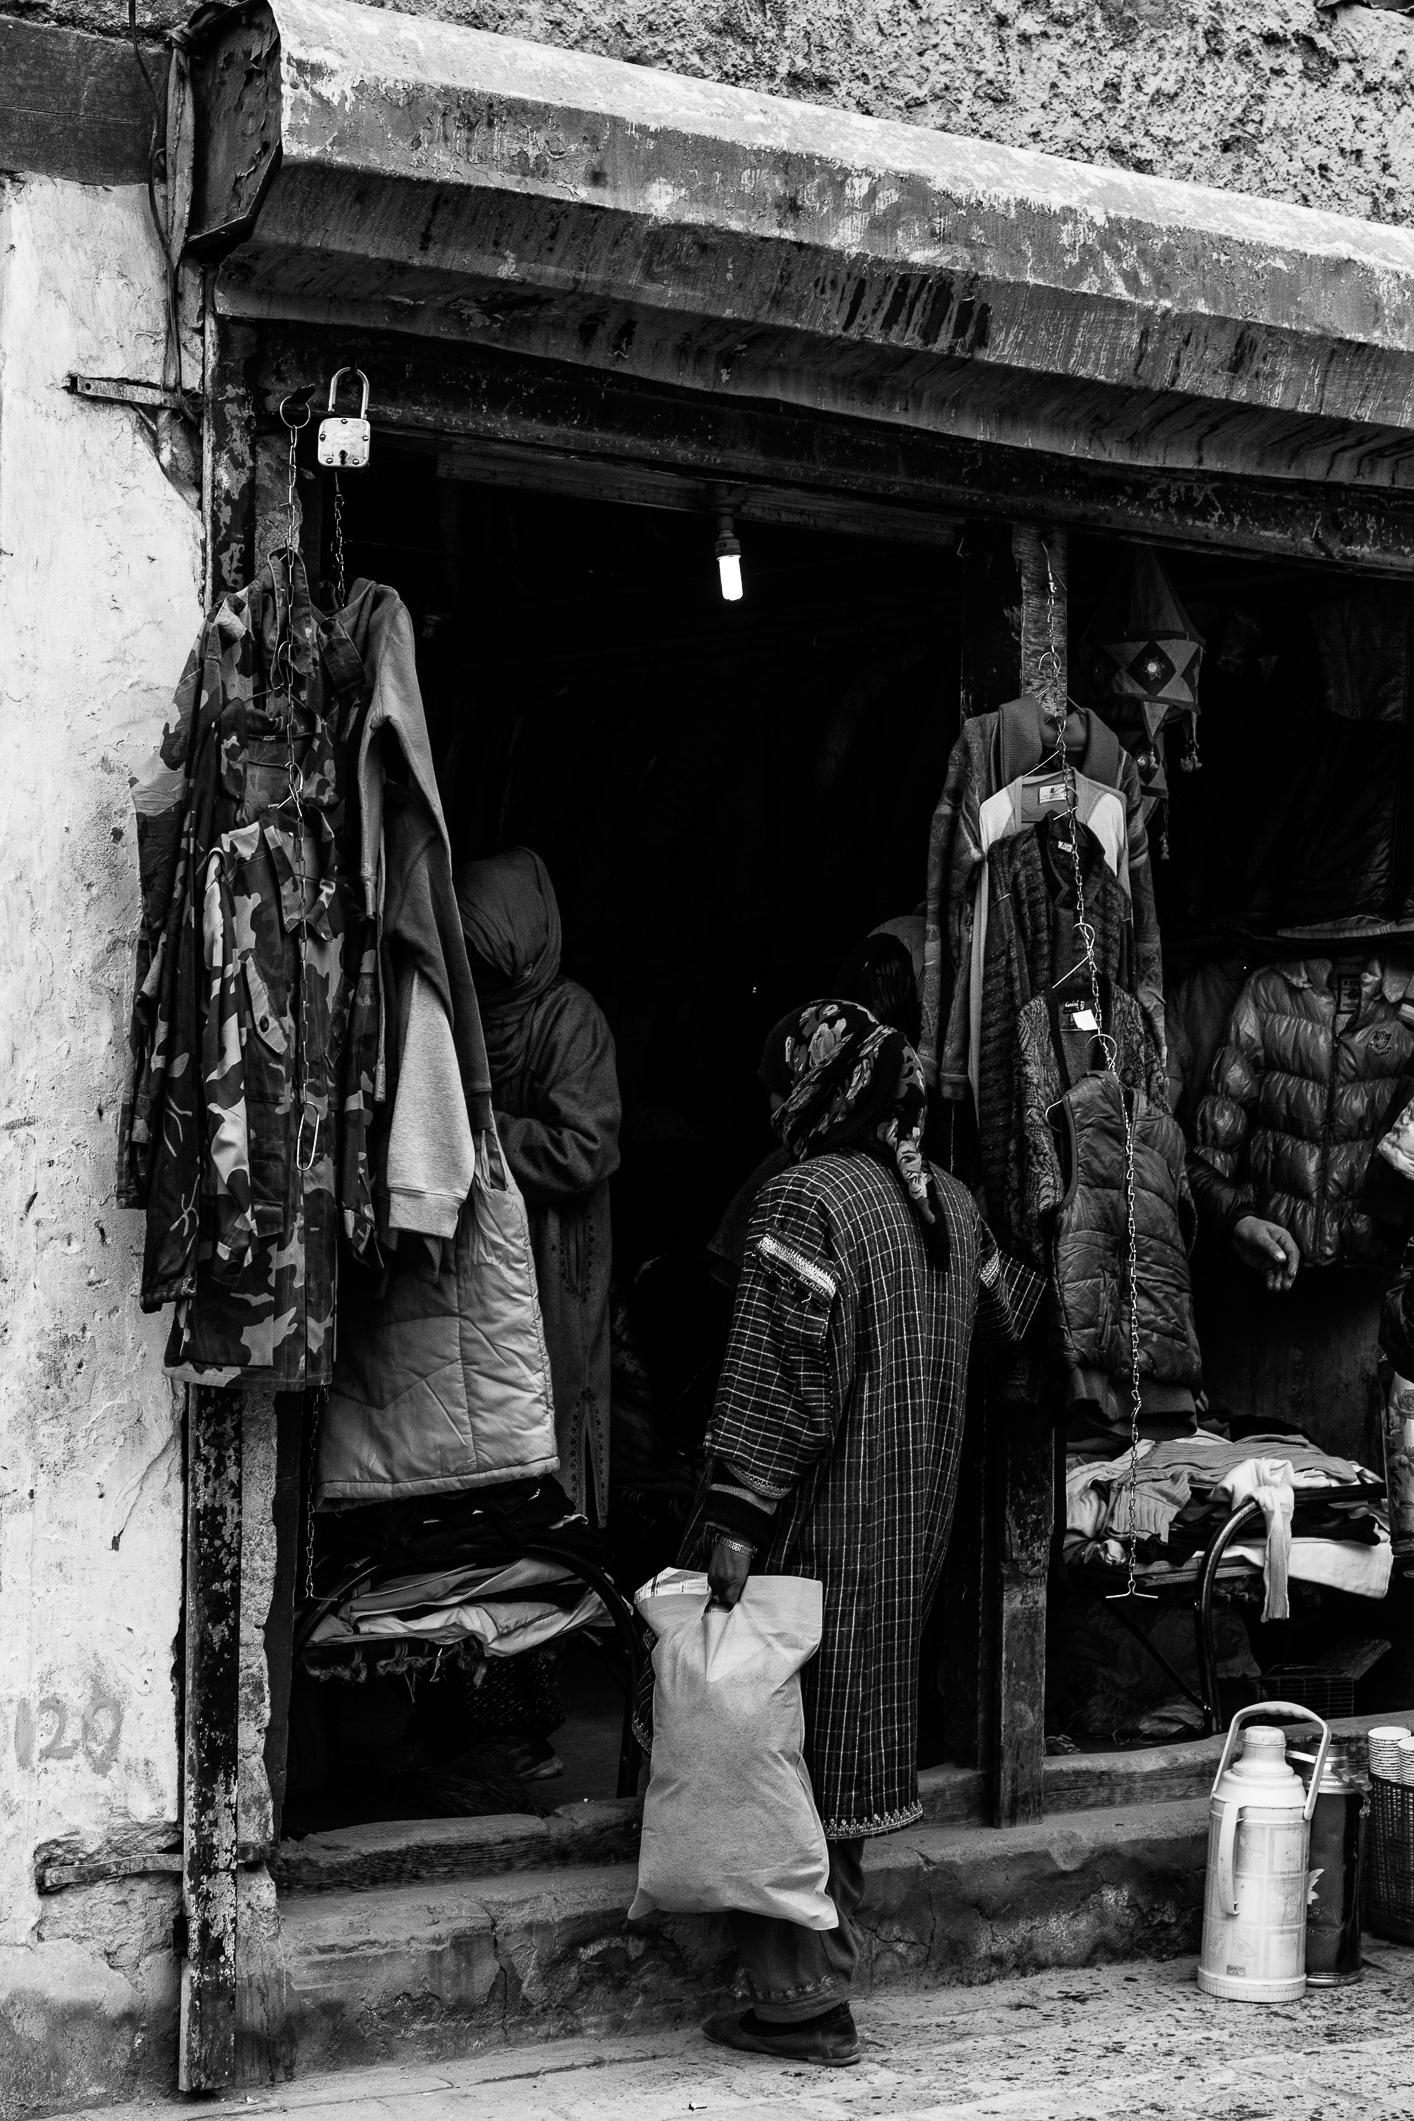 Ladakh_15_Irie_Langlois63.jpg